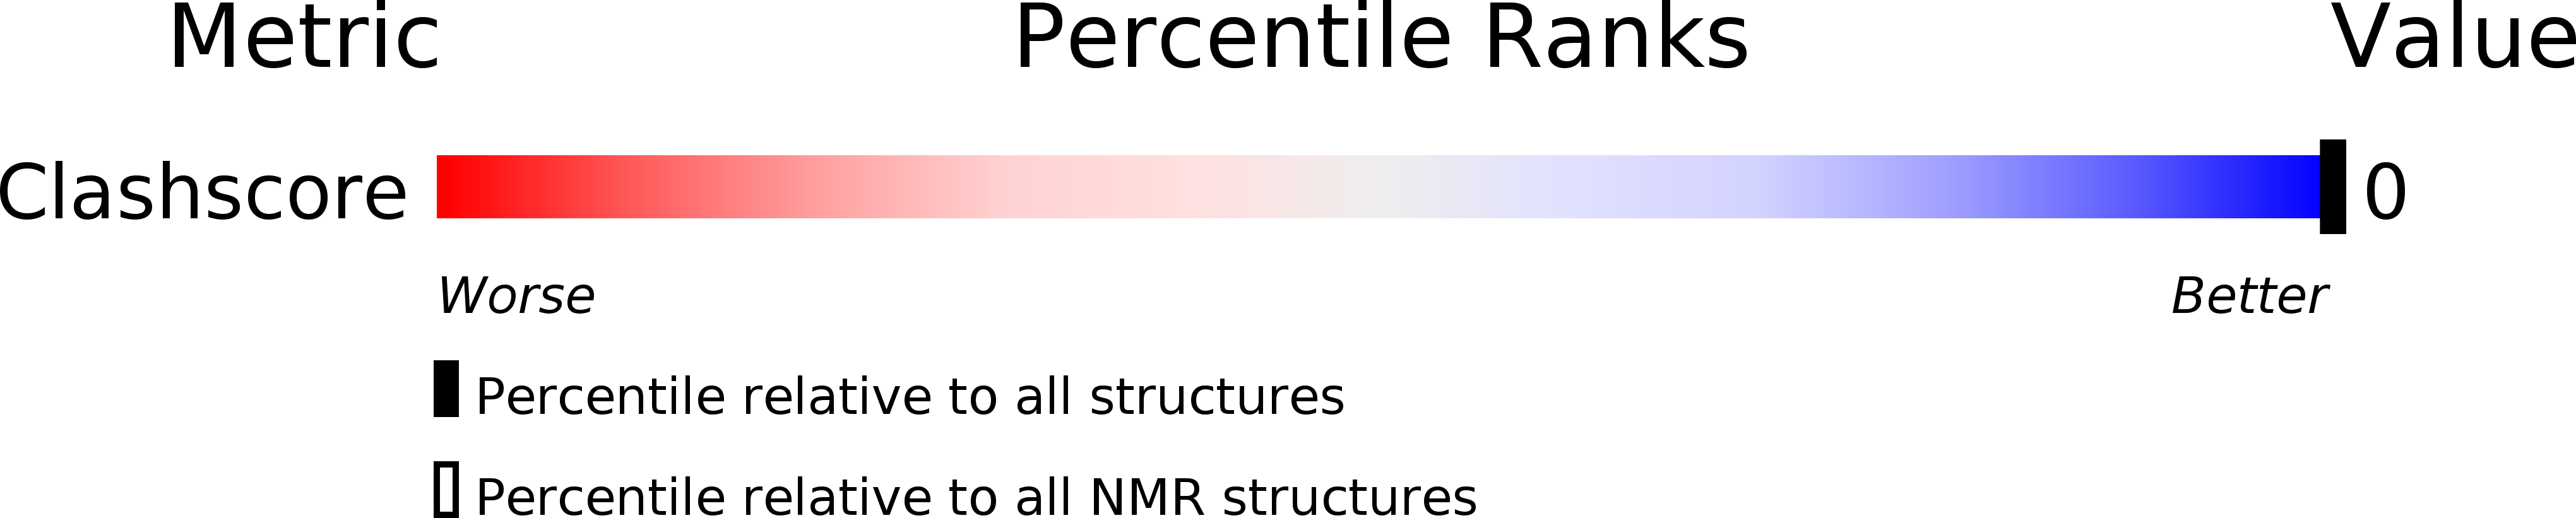 Human papillomavirus g quadruplexes